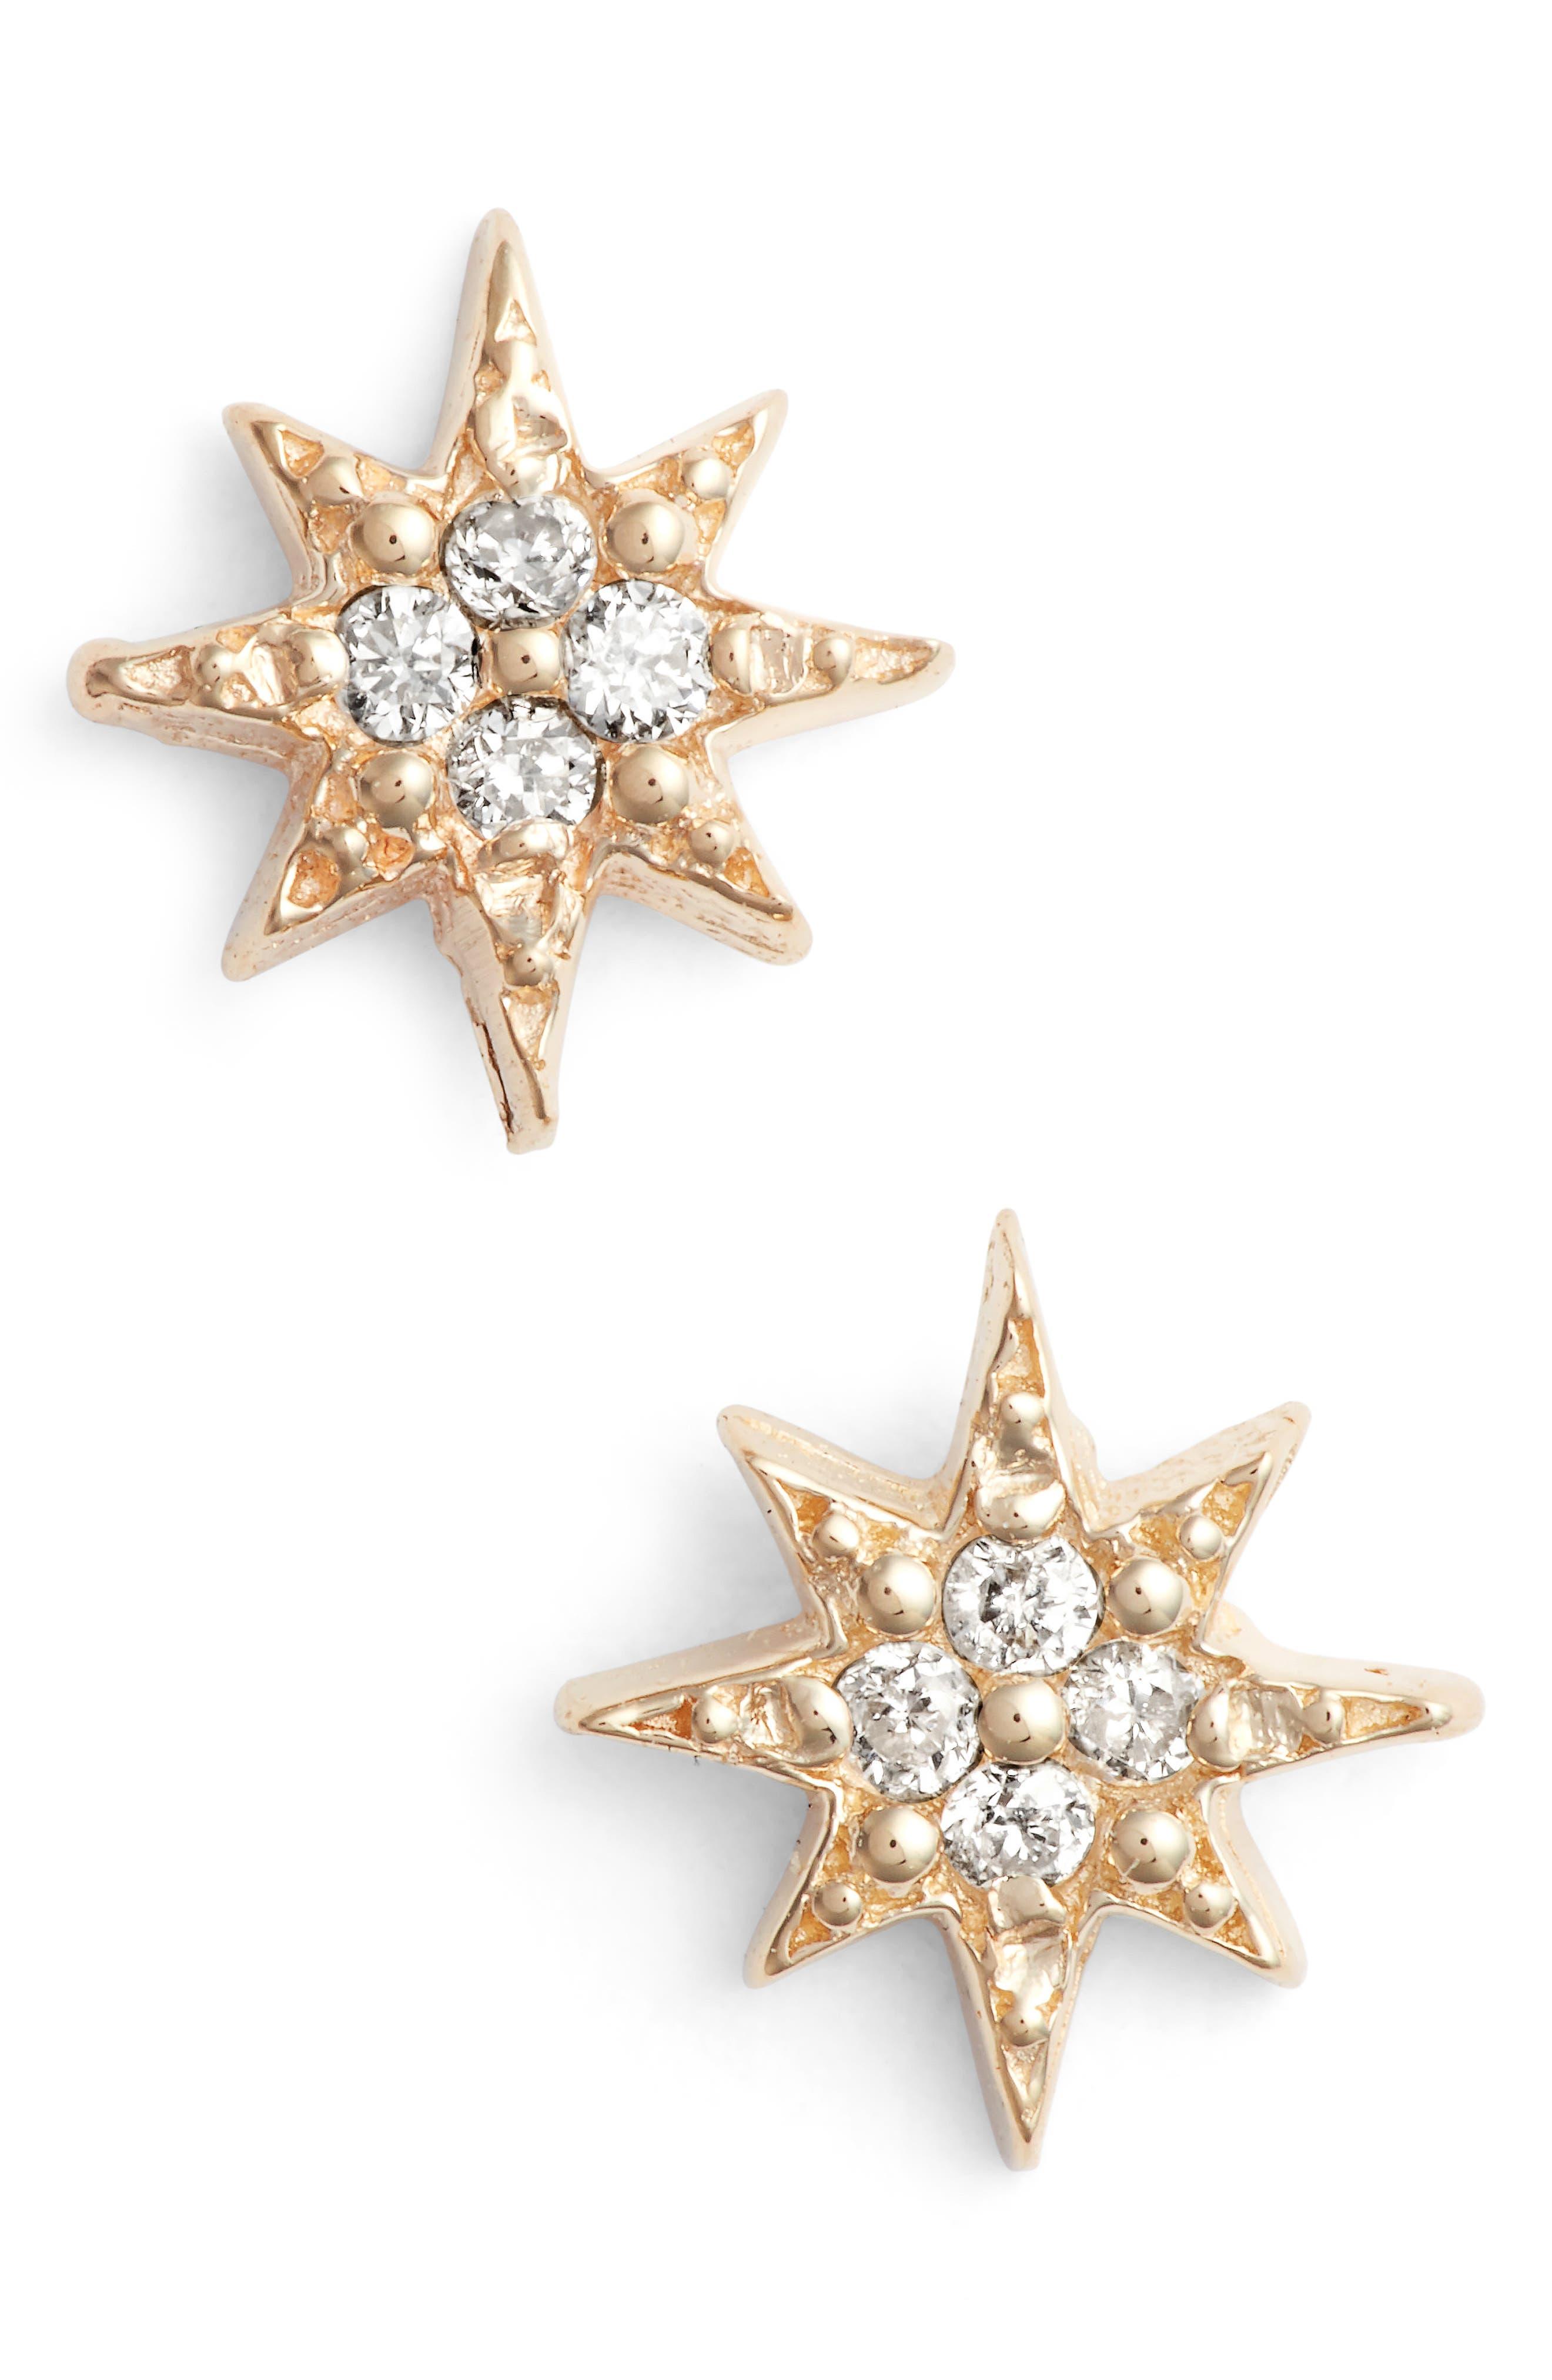 ANZIE MINI STARBURST DIAMOND EARRINGS